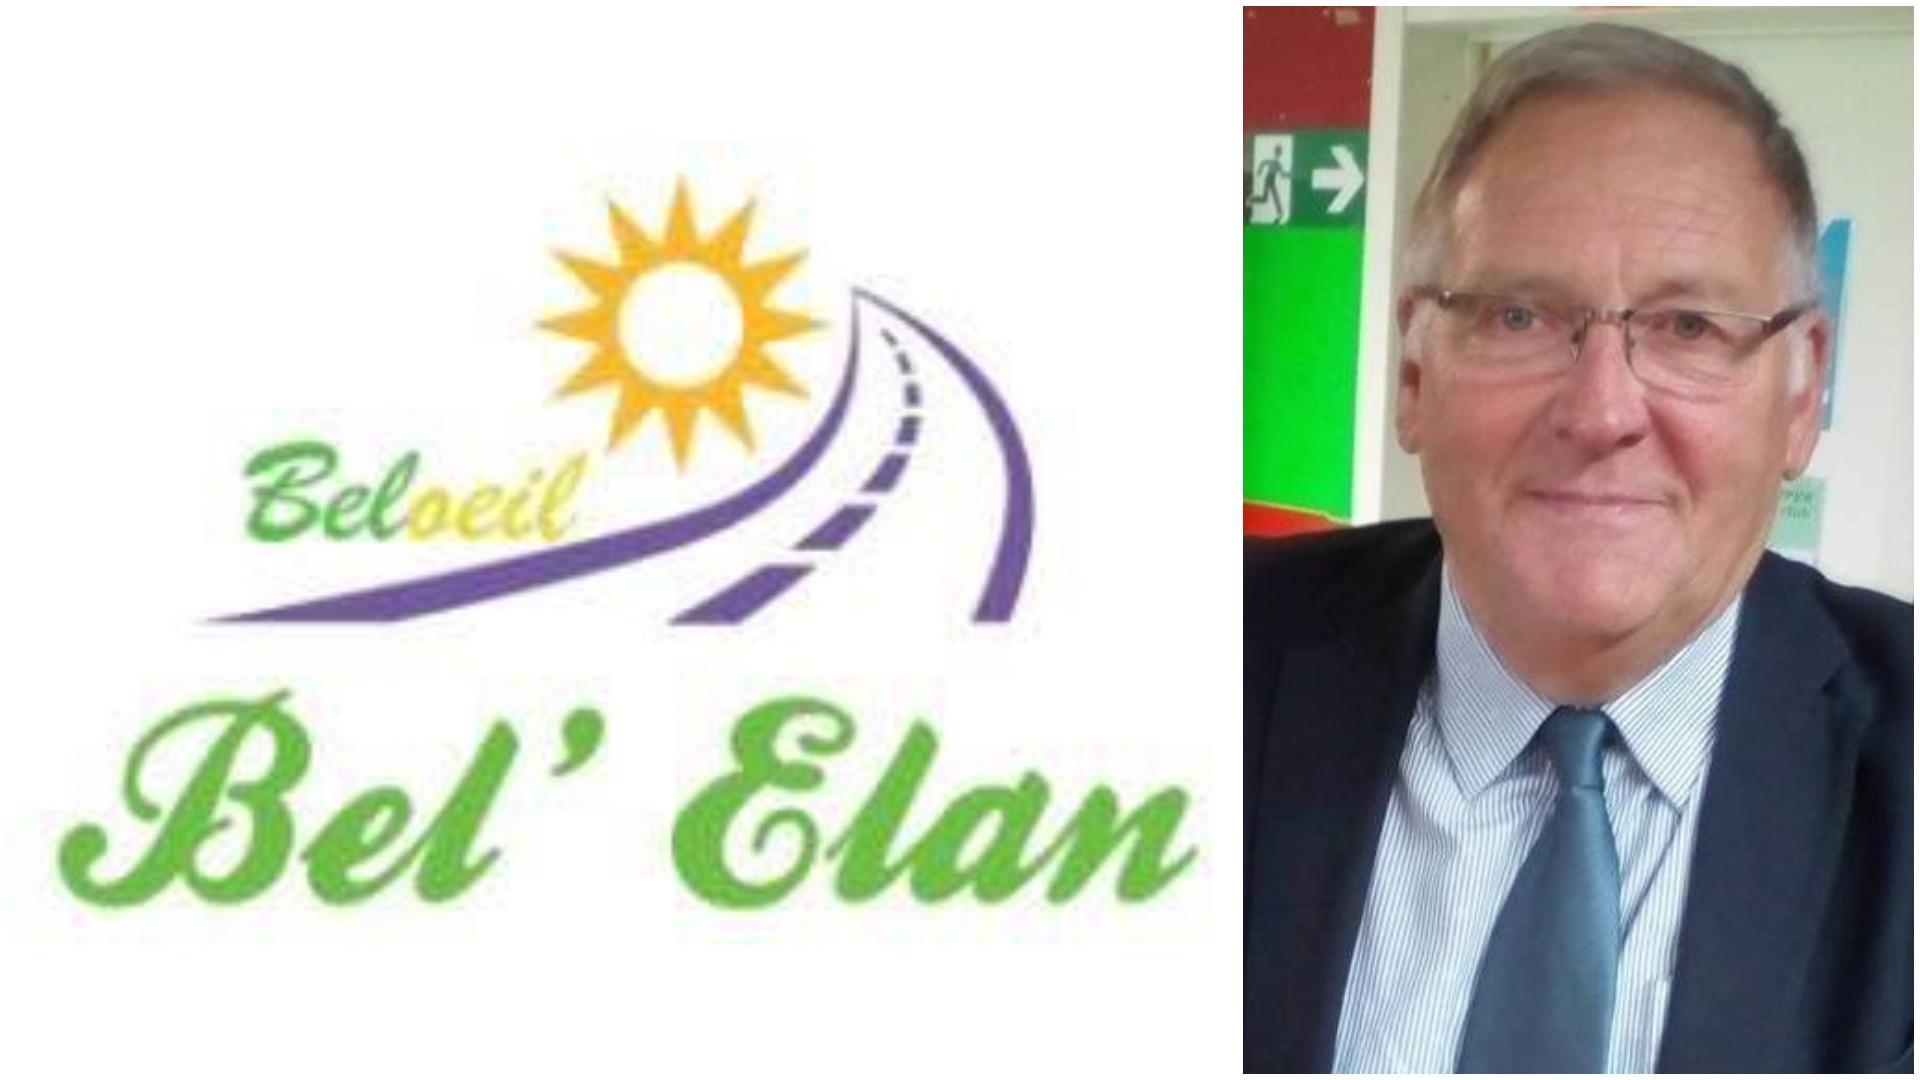 Michel Dubois révèle sa liste: Bel'Elan